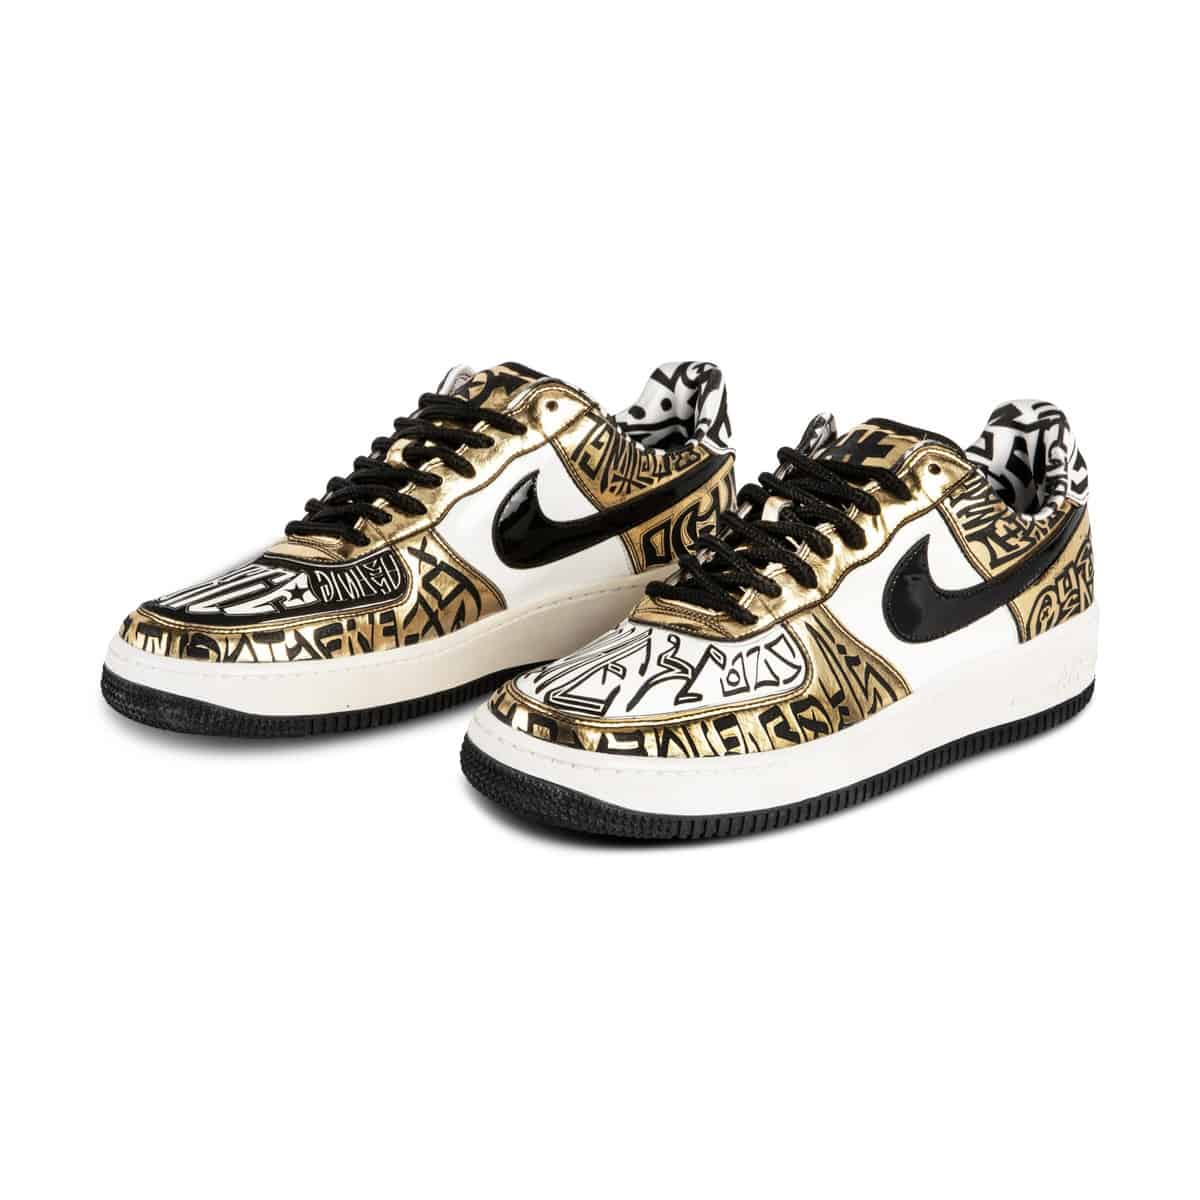 sothebys-rare-nike-sneaker-auction-2